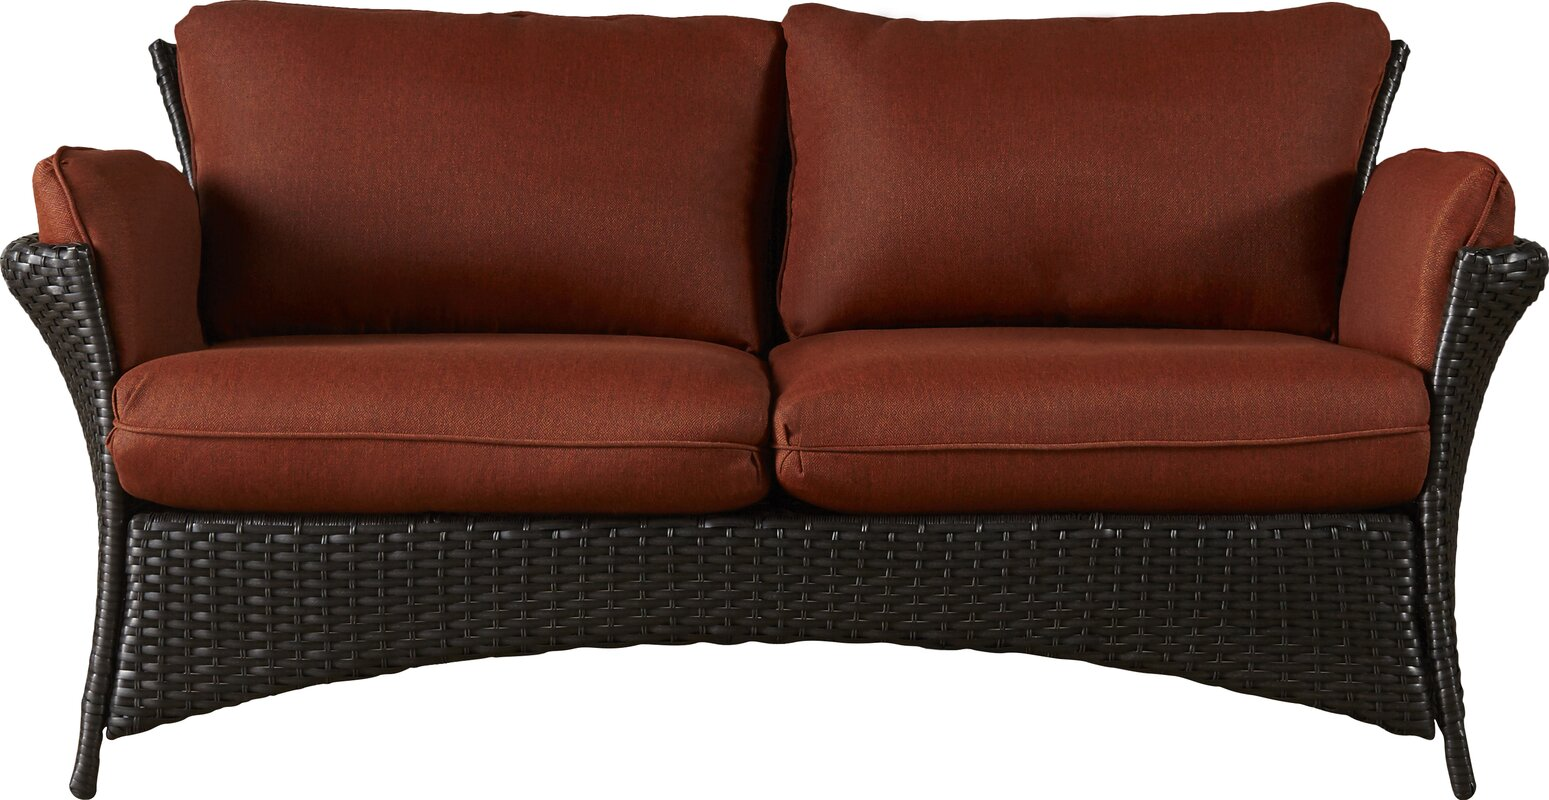 Exceptional Billington 4 Piece Sofa Set With Cushions